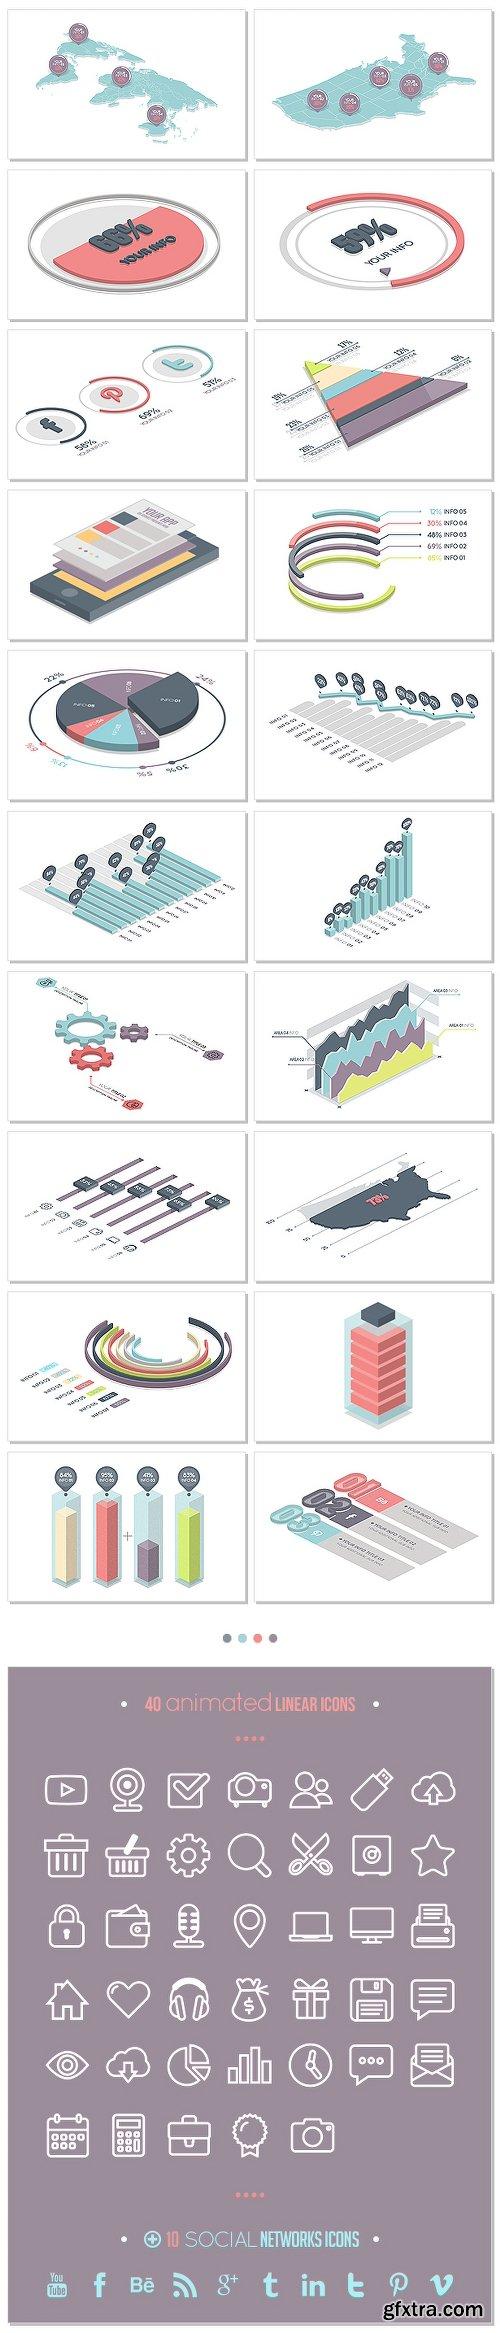 Videohive Isometric Infographics Bundle 19743356